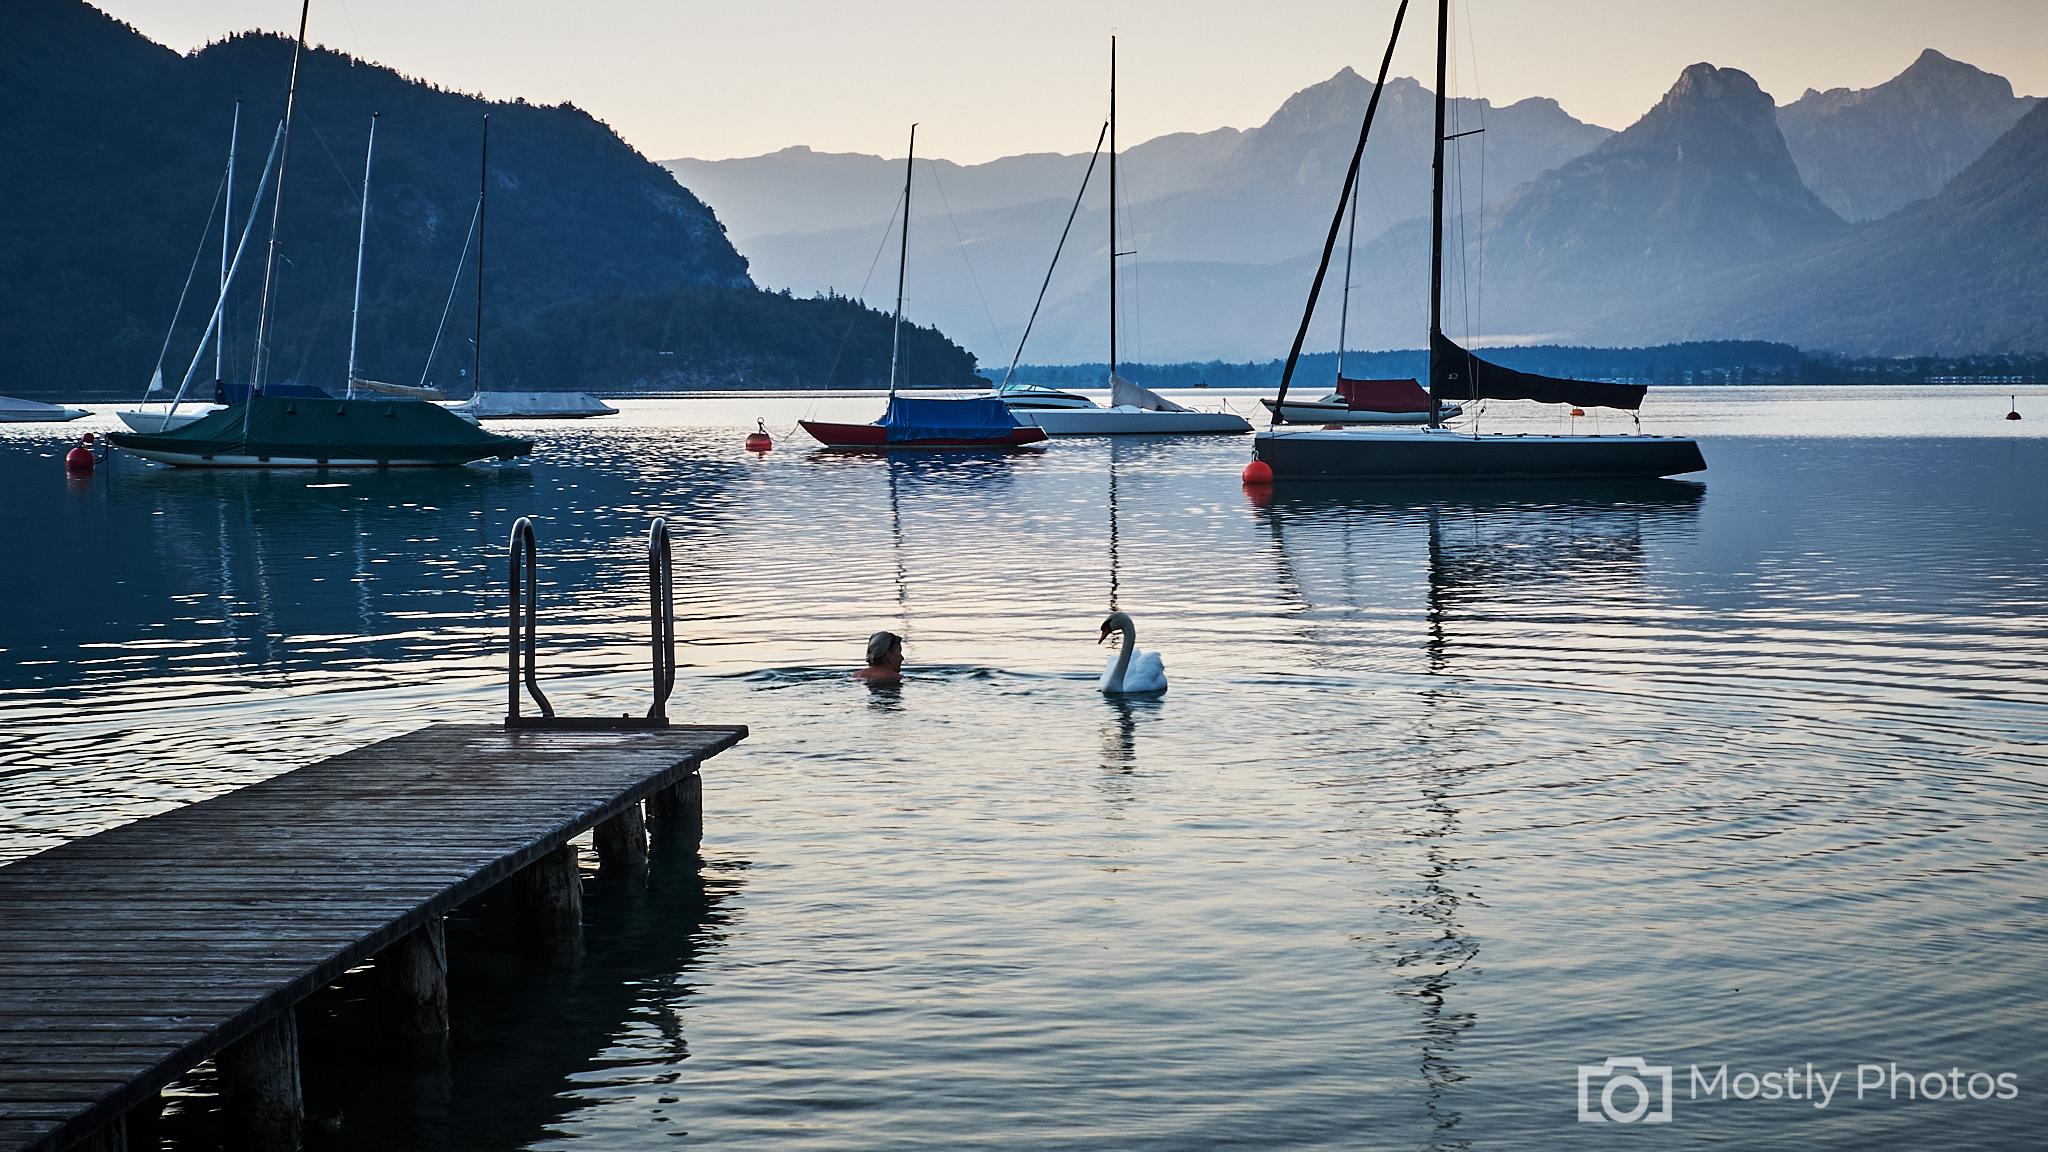 Swan and Swimmer Lake Wolfgang, Austria - Fuji X-T2